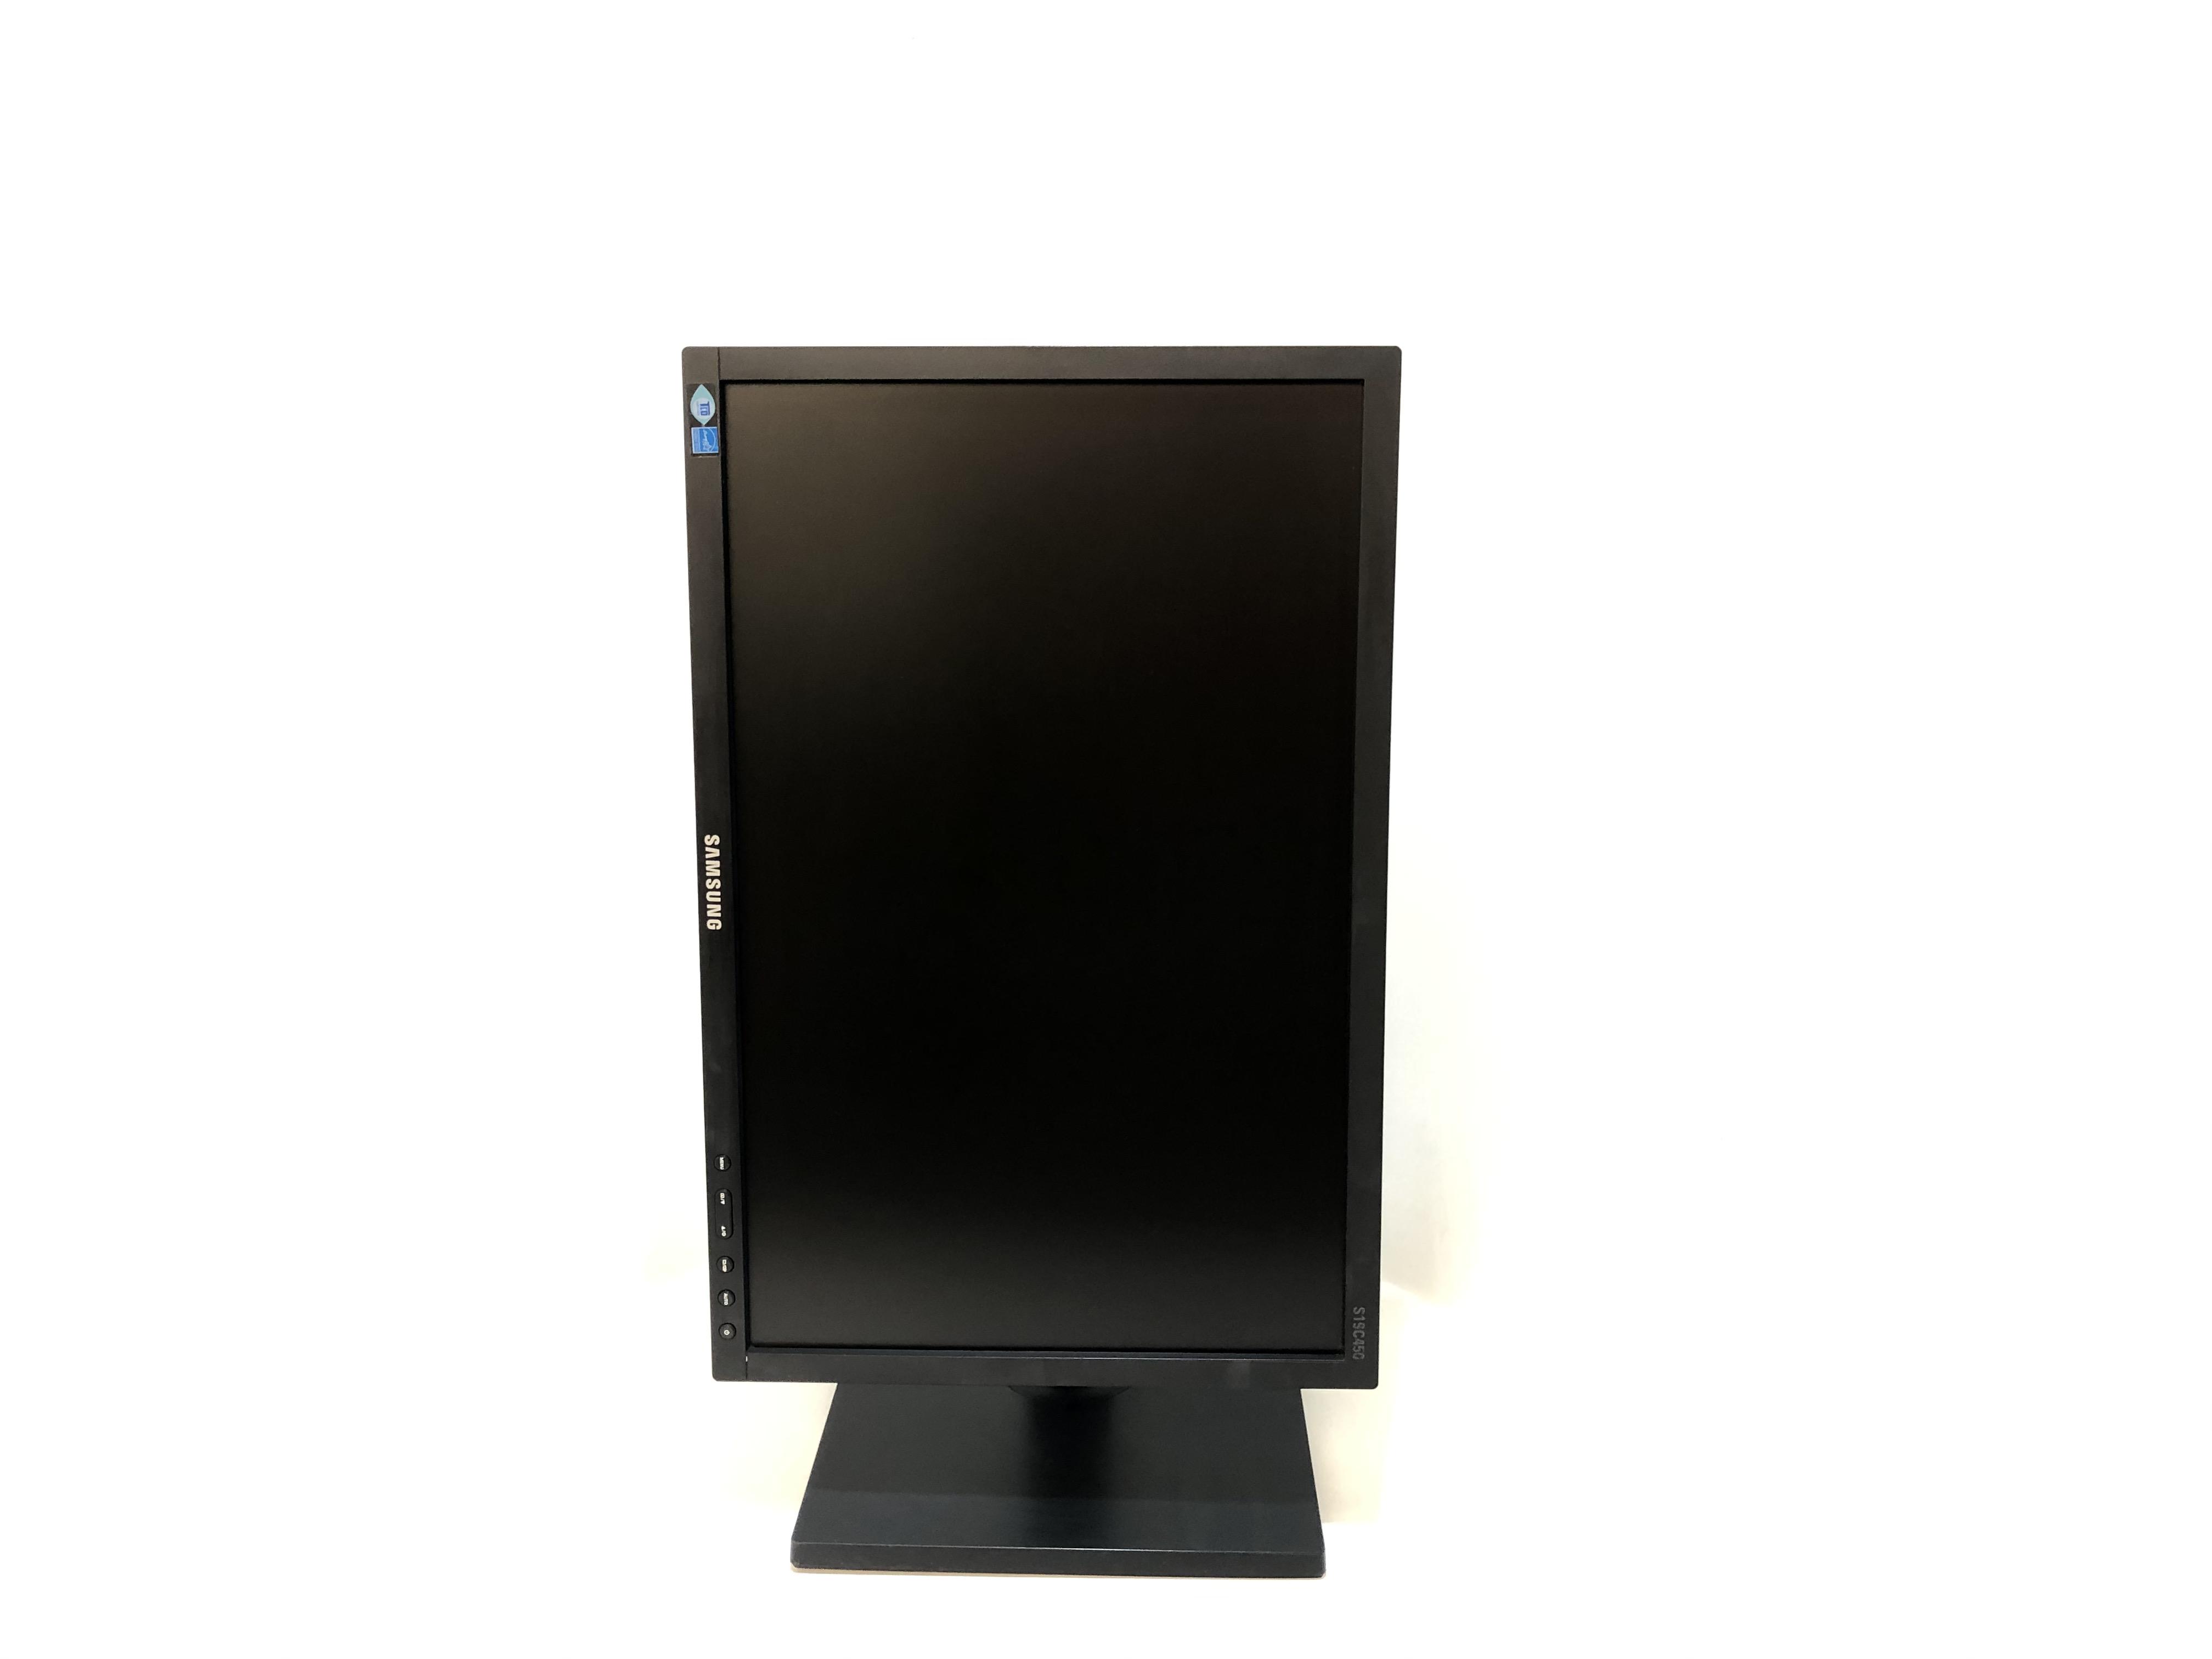 Samsung S19C450MW No 3